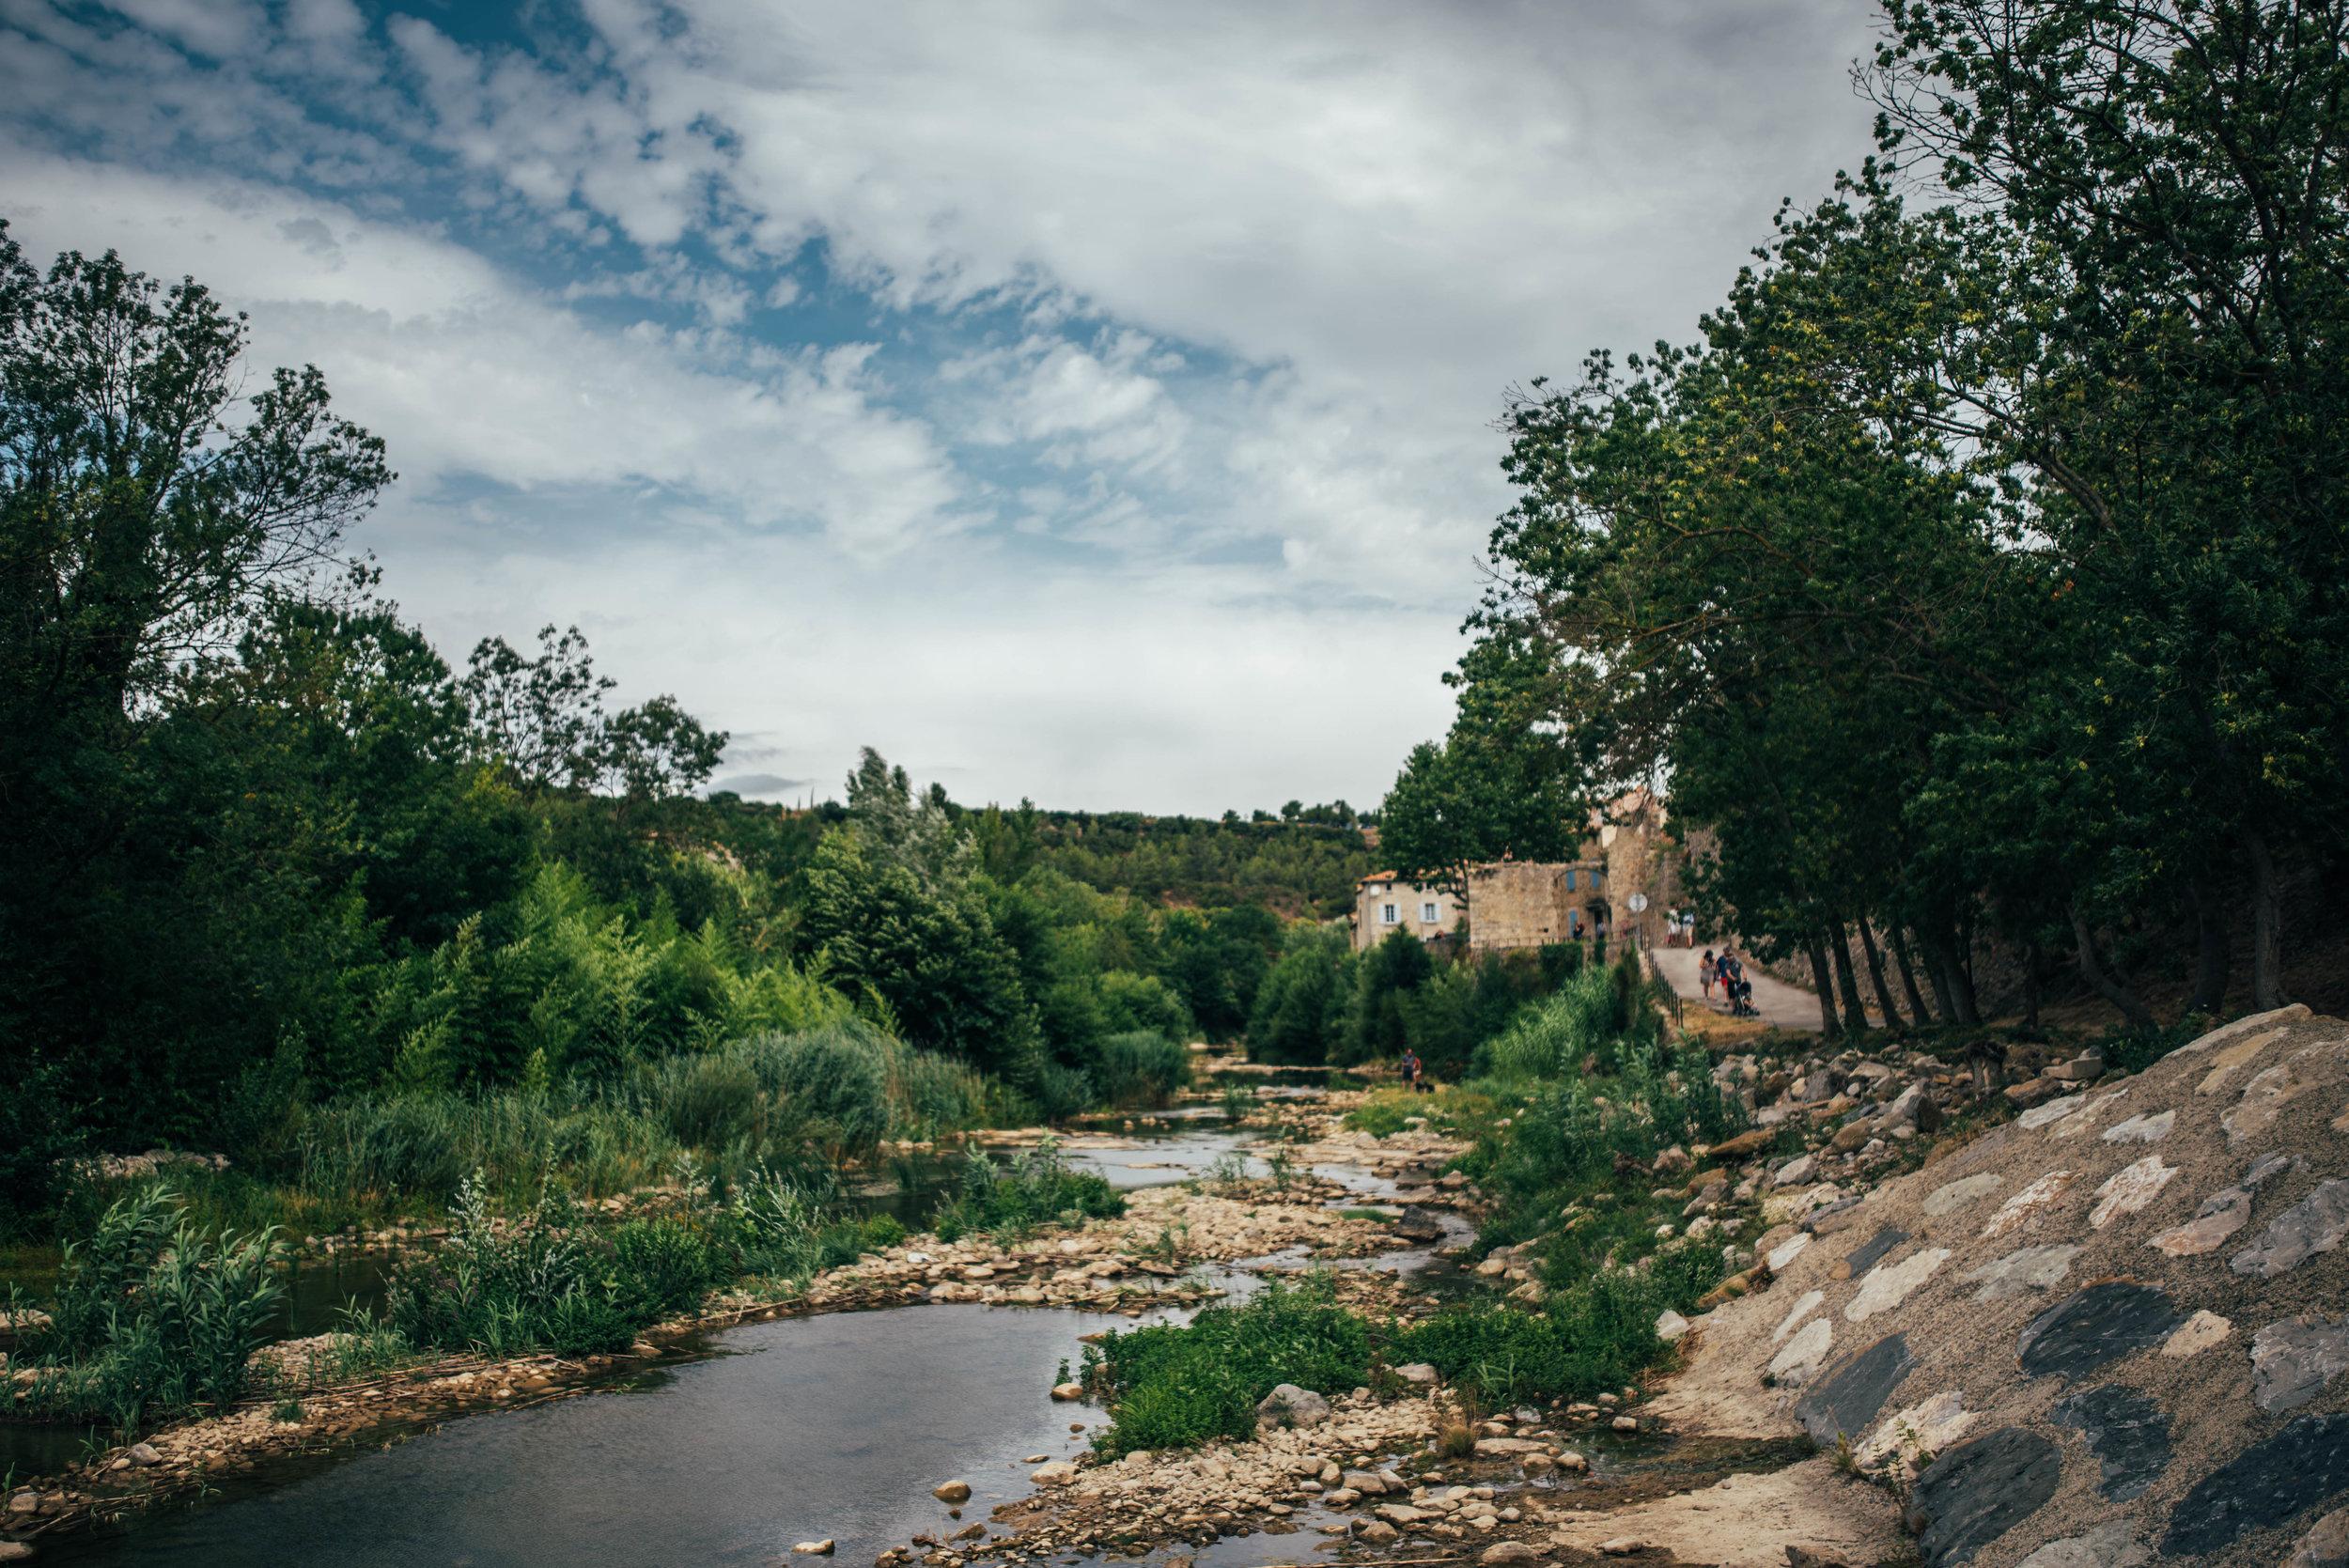 River banks in Lagrasse France Essex UK Documentary Photographer